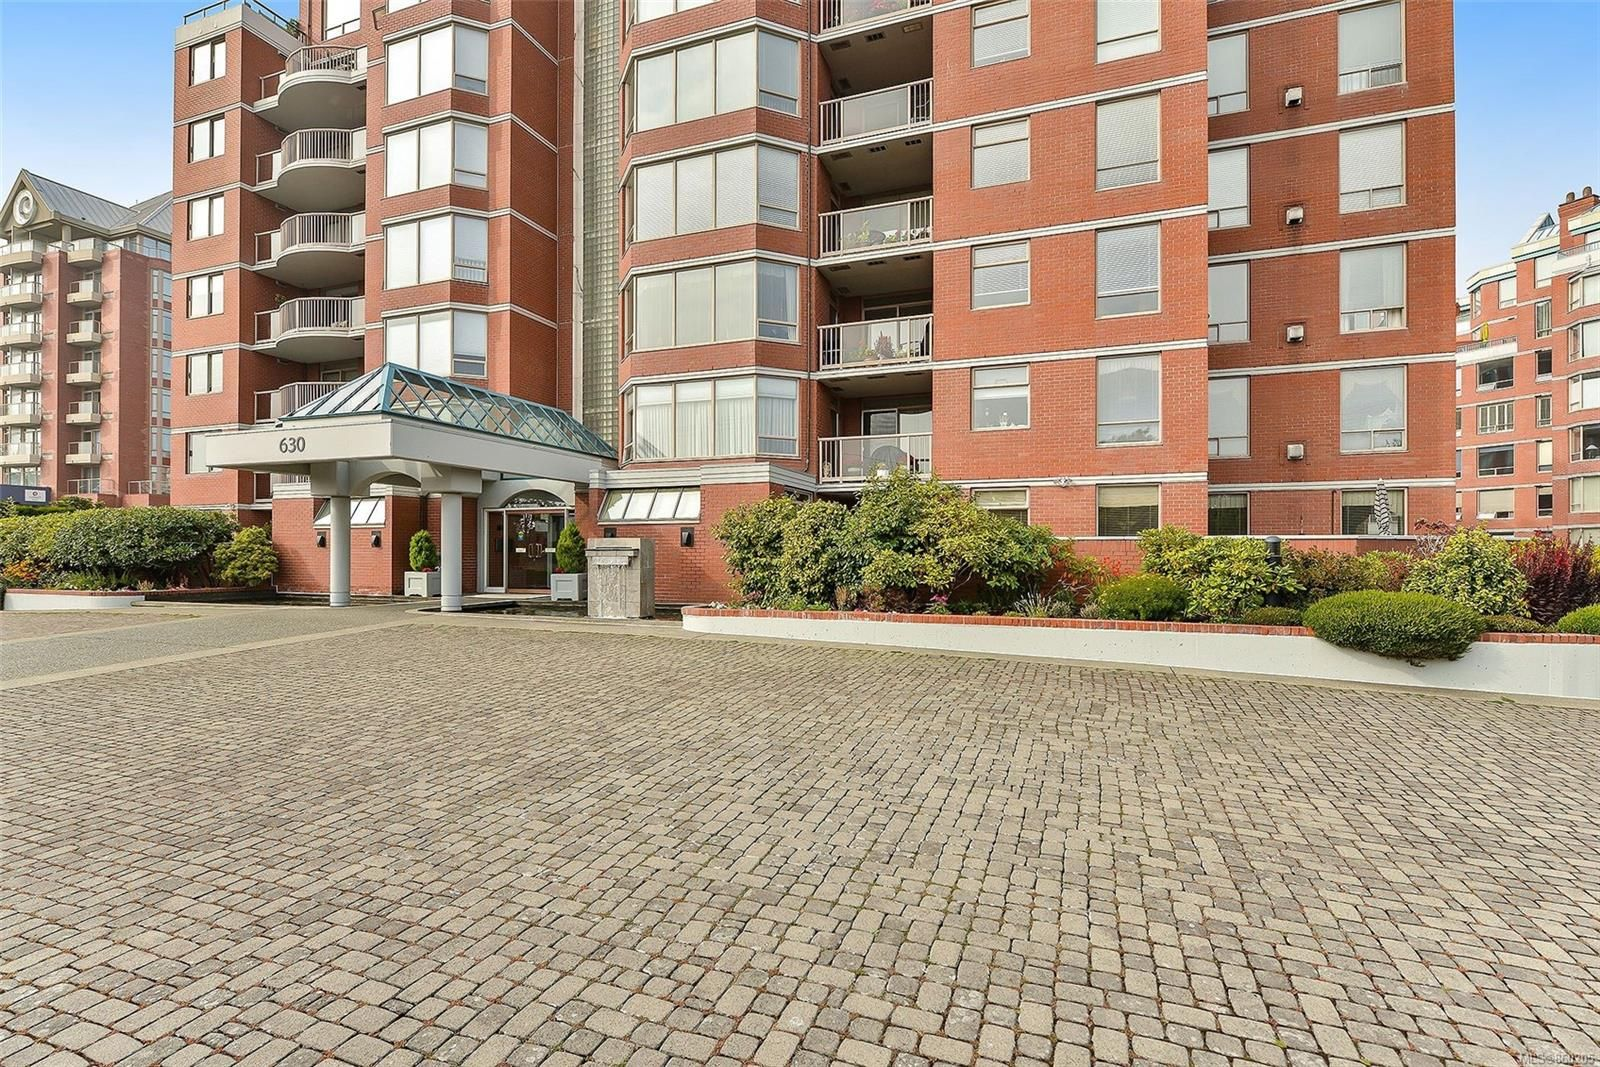 Photo 38: Photos: 204 630 Montreal St in : Vi James Bay Condo for sale (Victoria)  : MLS®# 860205